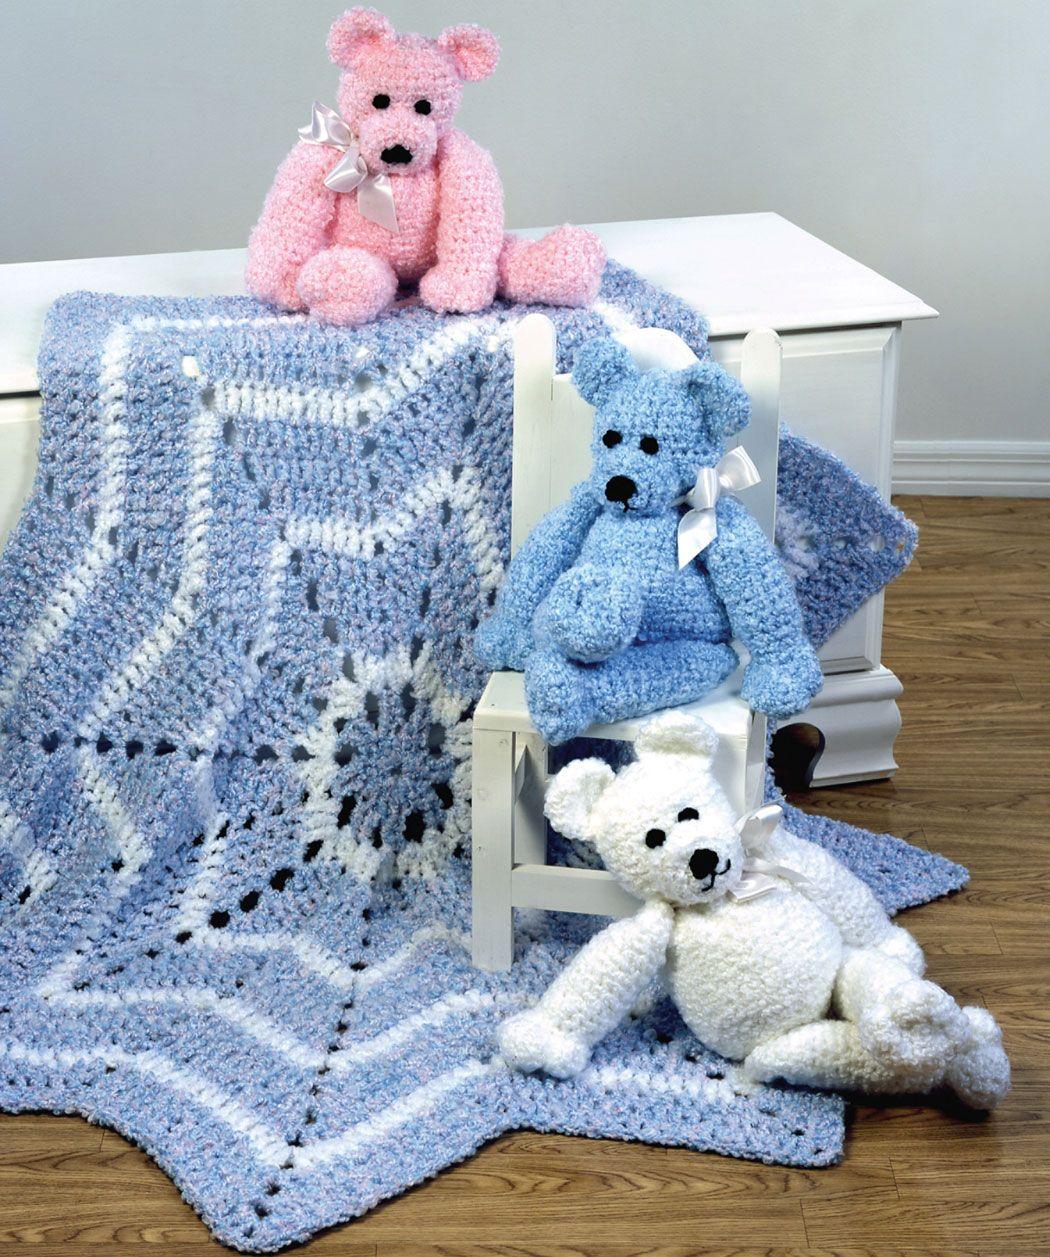 Merry Go Round Blanket Amp Teddy Bear Crochet Pattern Red